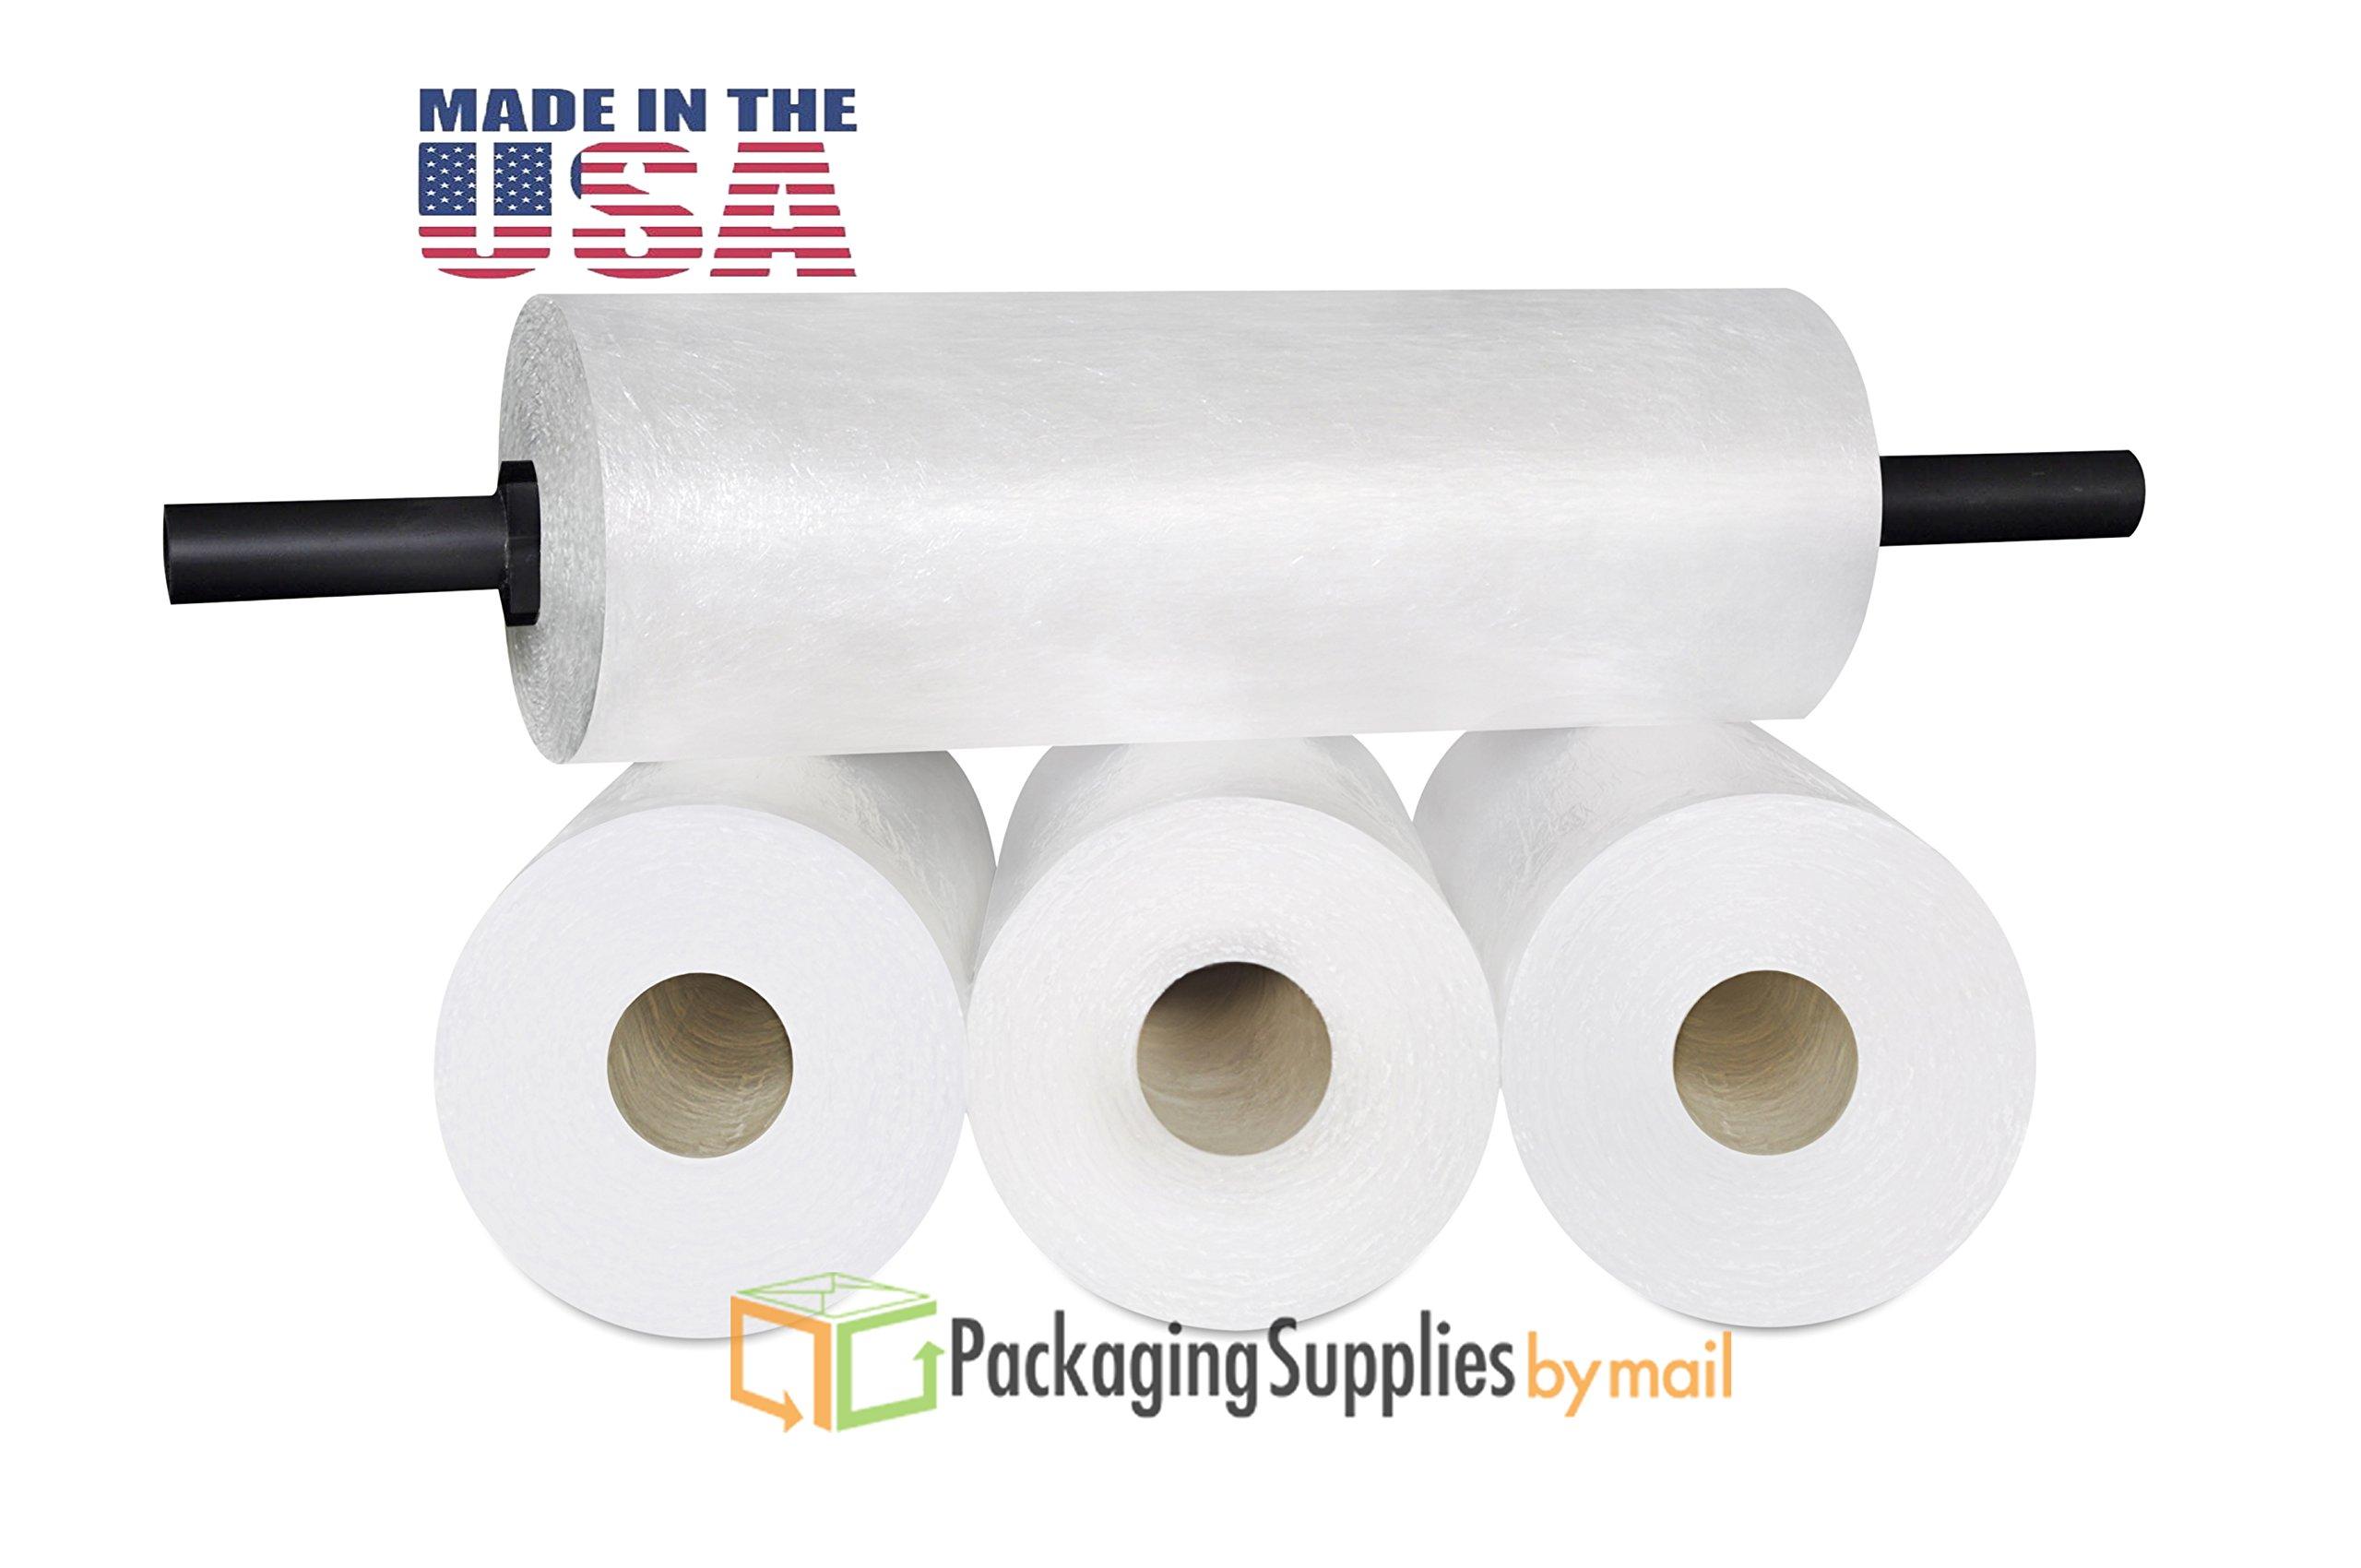 Stretch Film Wrap, Coreless Shrink Wrap Roll, Clear, 18 Inch x 2000 Feet, 8 Pack by PackagingSuppliesByMail